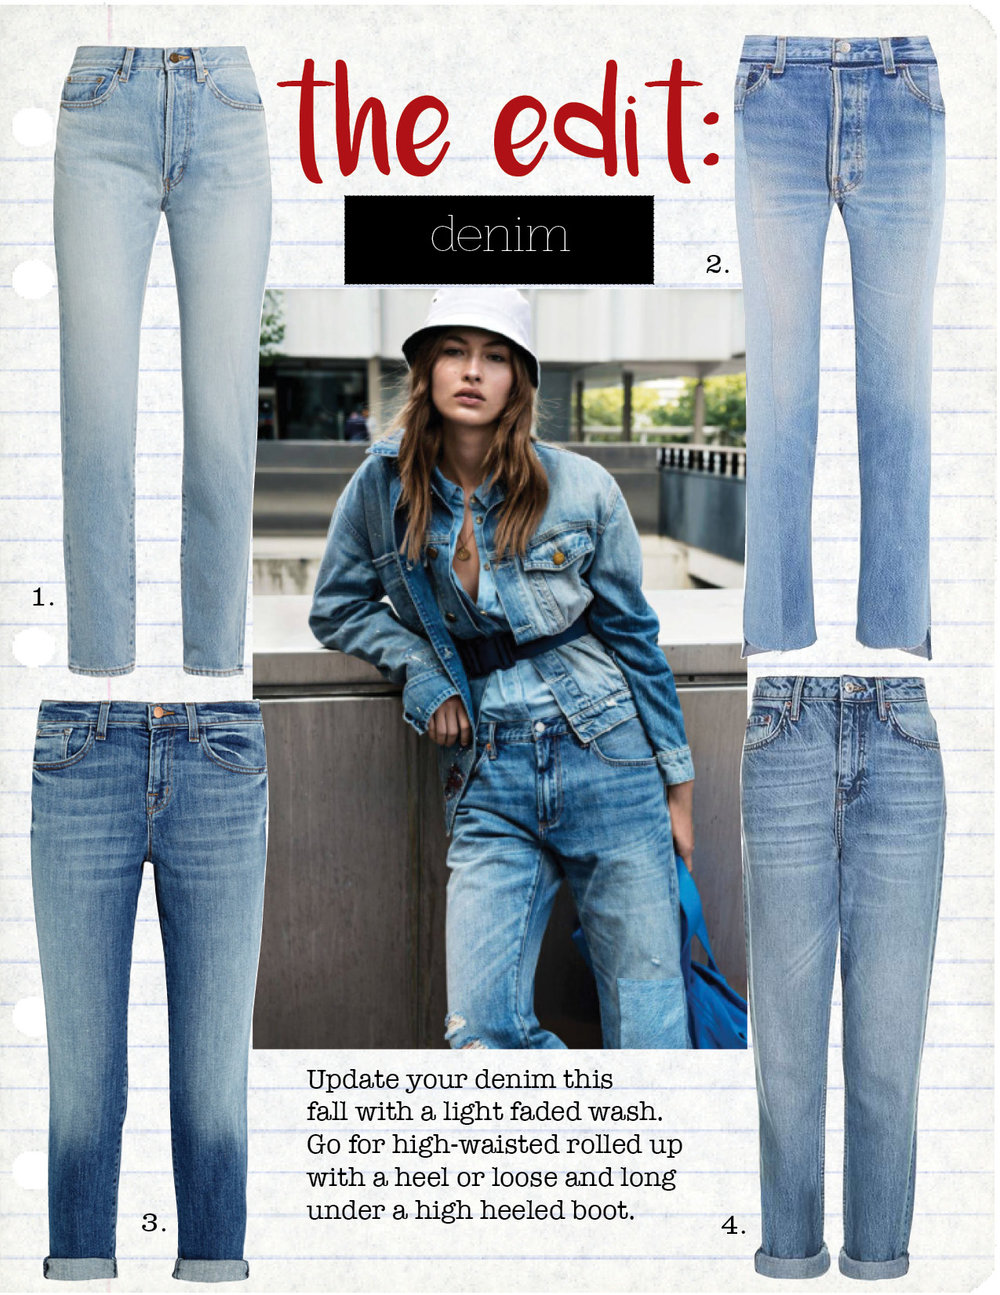 1. Saint Laurent High-Rise Straight-Leg Jeans, $750,  net-a-porter.com  2. Vetements reworked High-rise slim-leg jeans, $1460,  net-a-porter.com  3. J Brand Cropped mid rise slim leg jeans, $240,  net-a-porter.com  4. Top Shop high waist boyfriends jeans, $80,  topshop.com